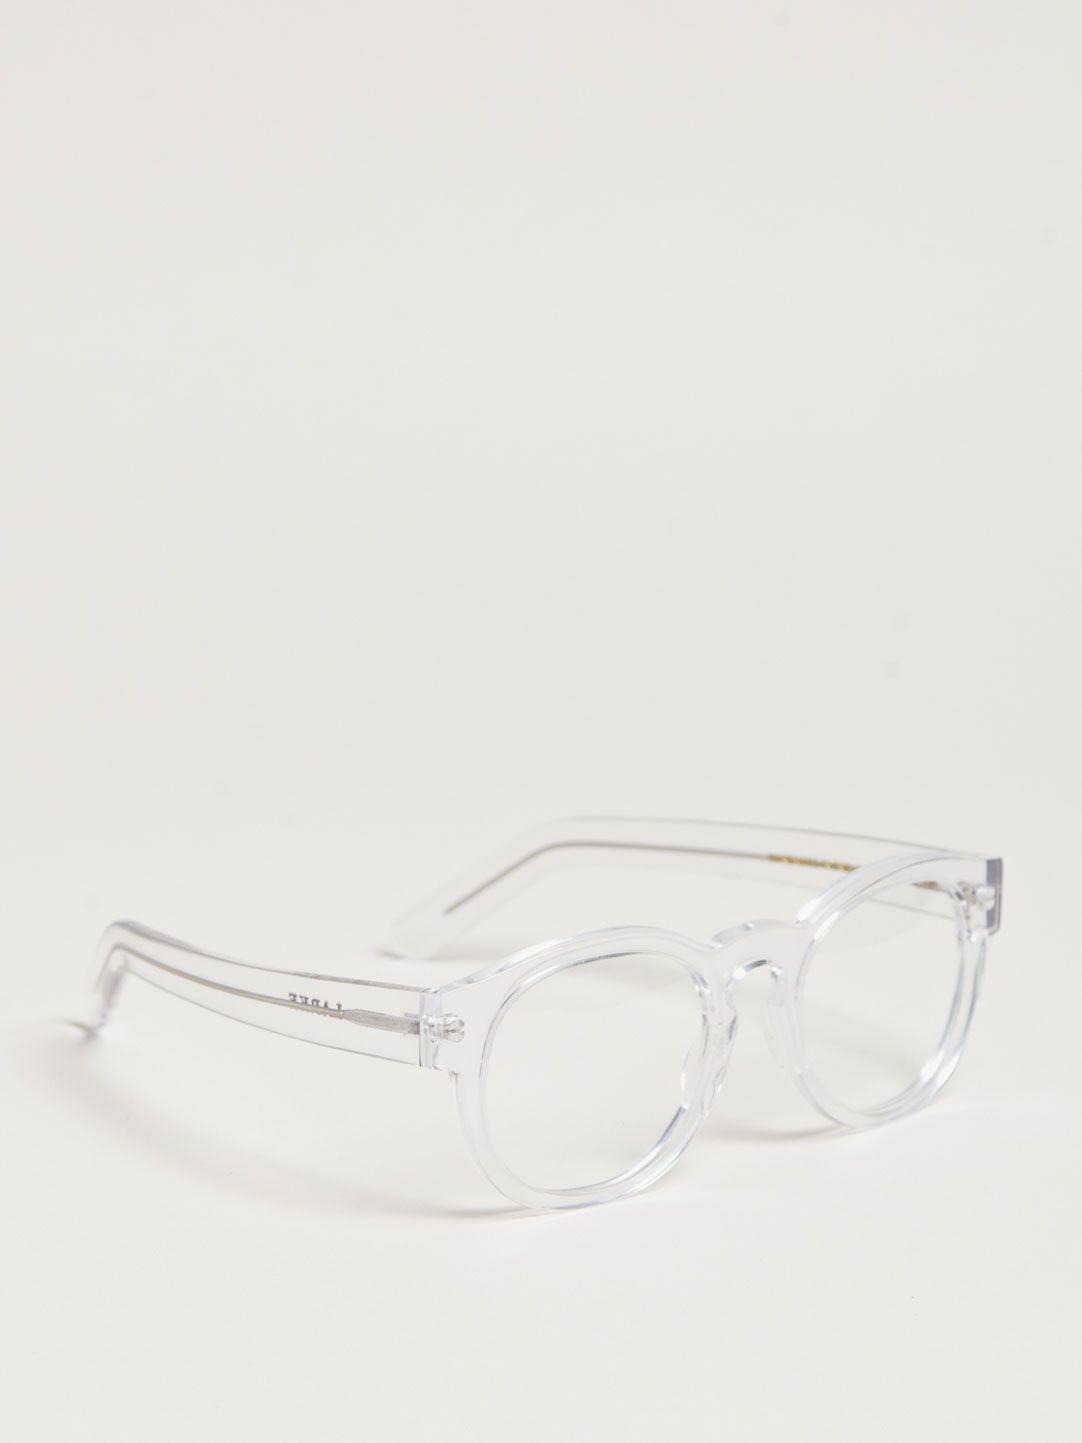 2336059ea Style - Minimal + Classic: Larke Unisex Gill Clear Glasses Oculos De Sol,  Olhos